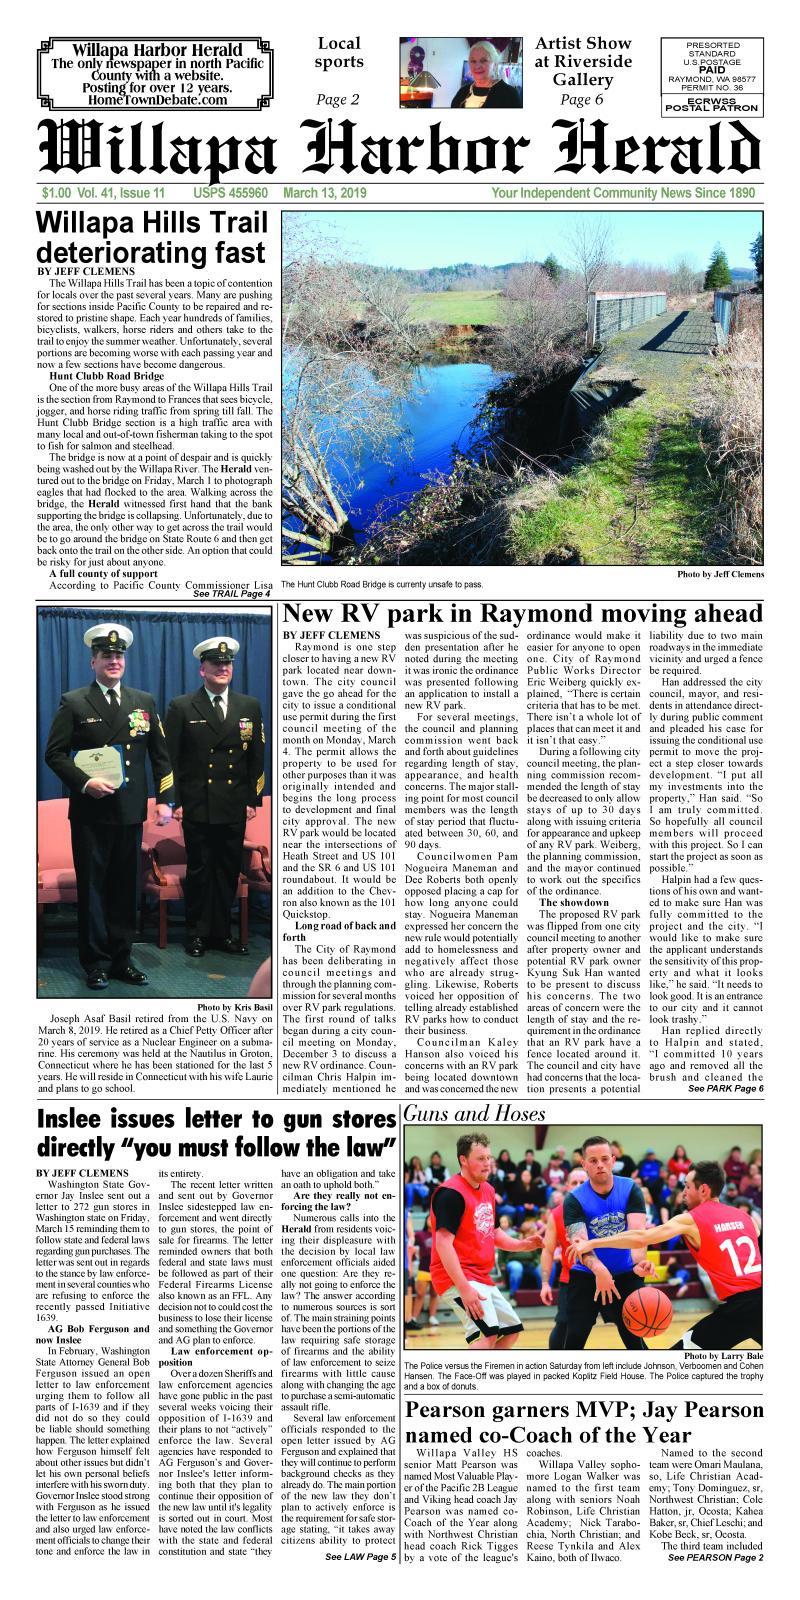 March 13, 2019 Willapa Harbor Herald